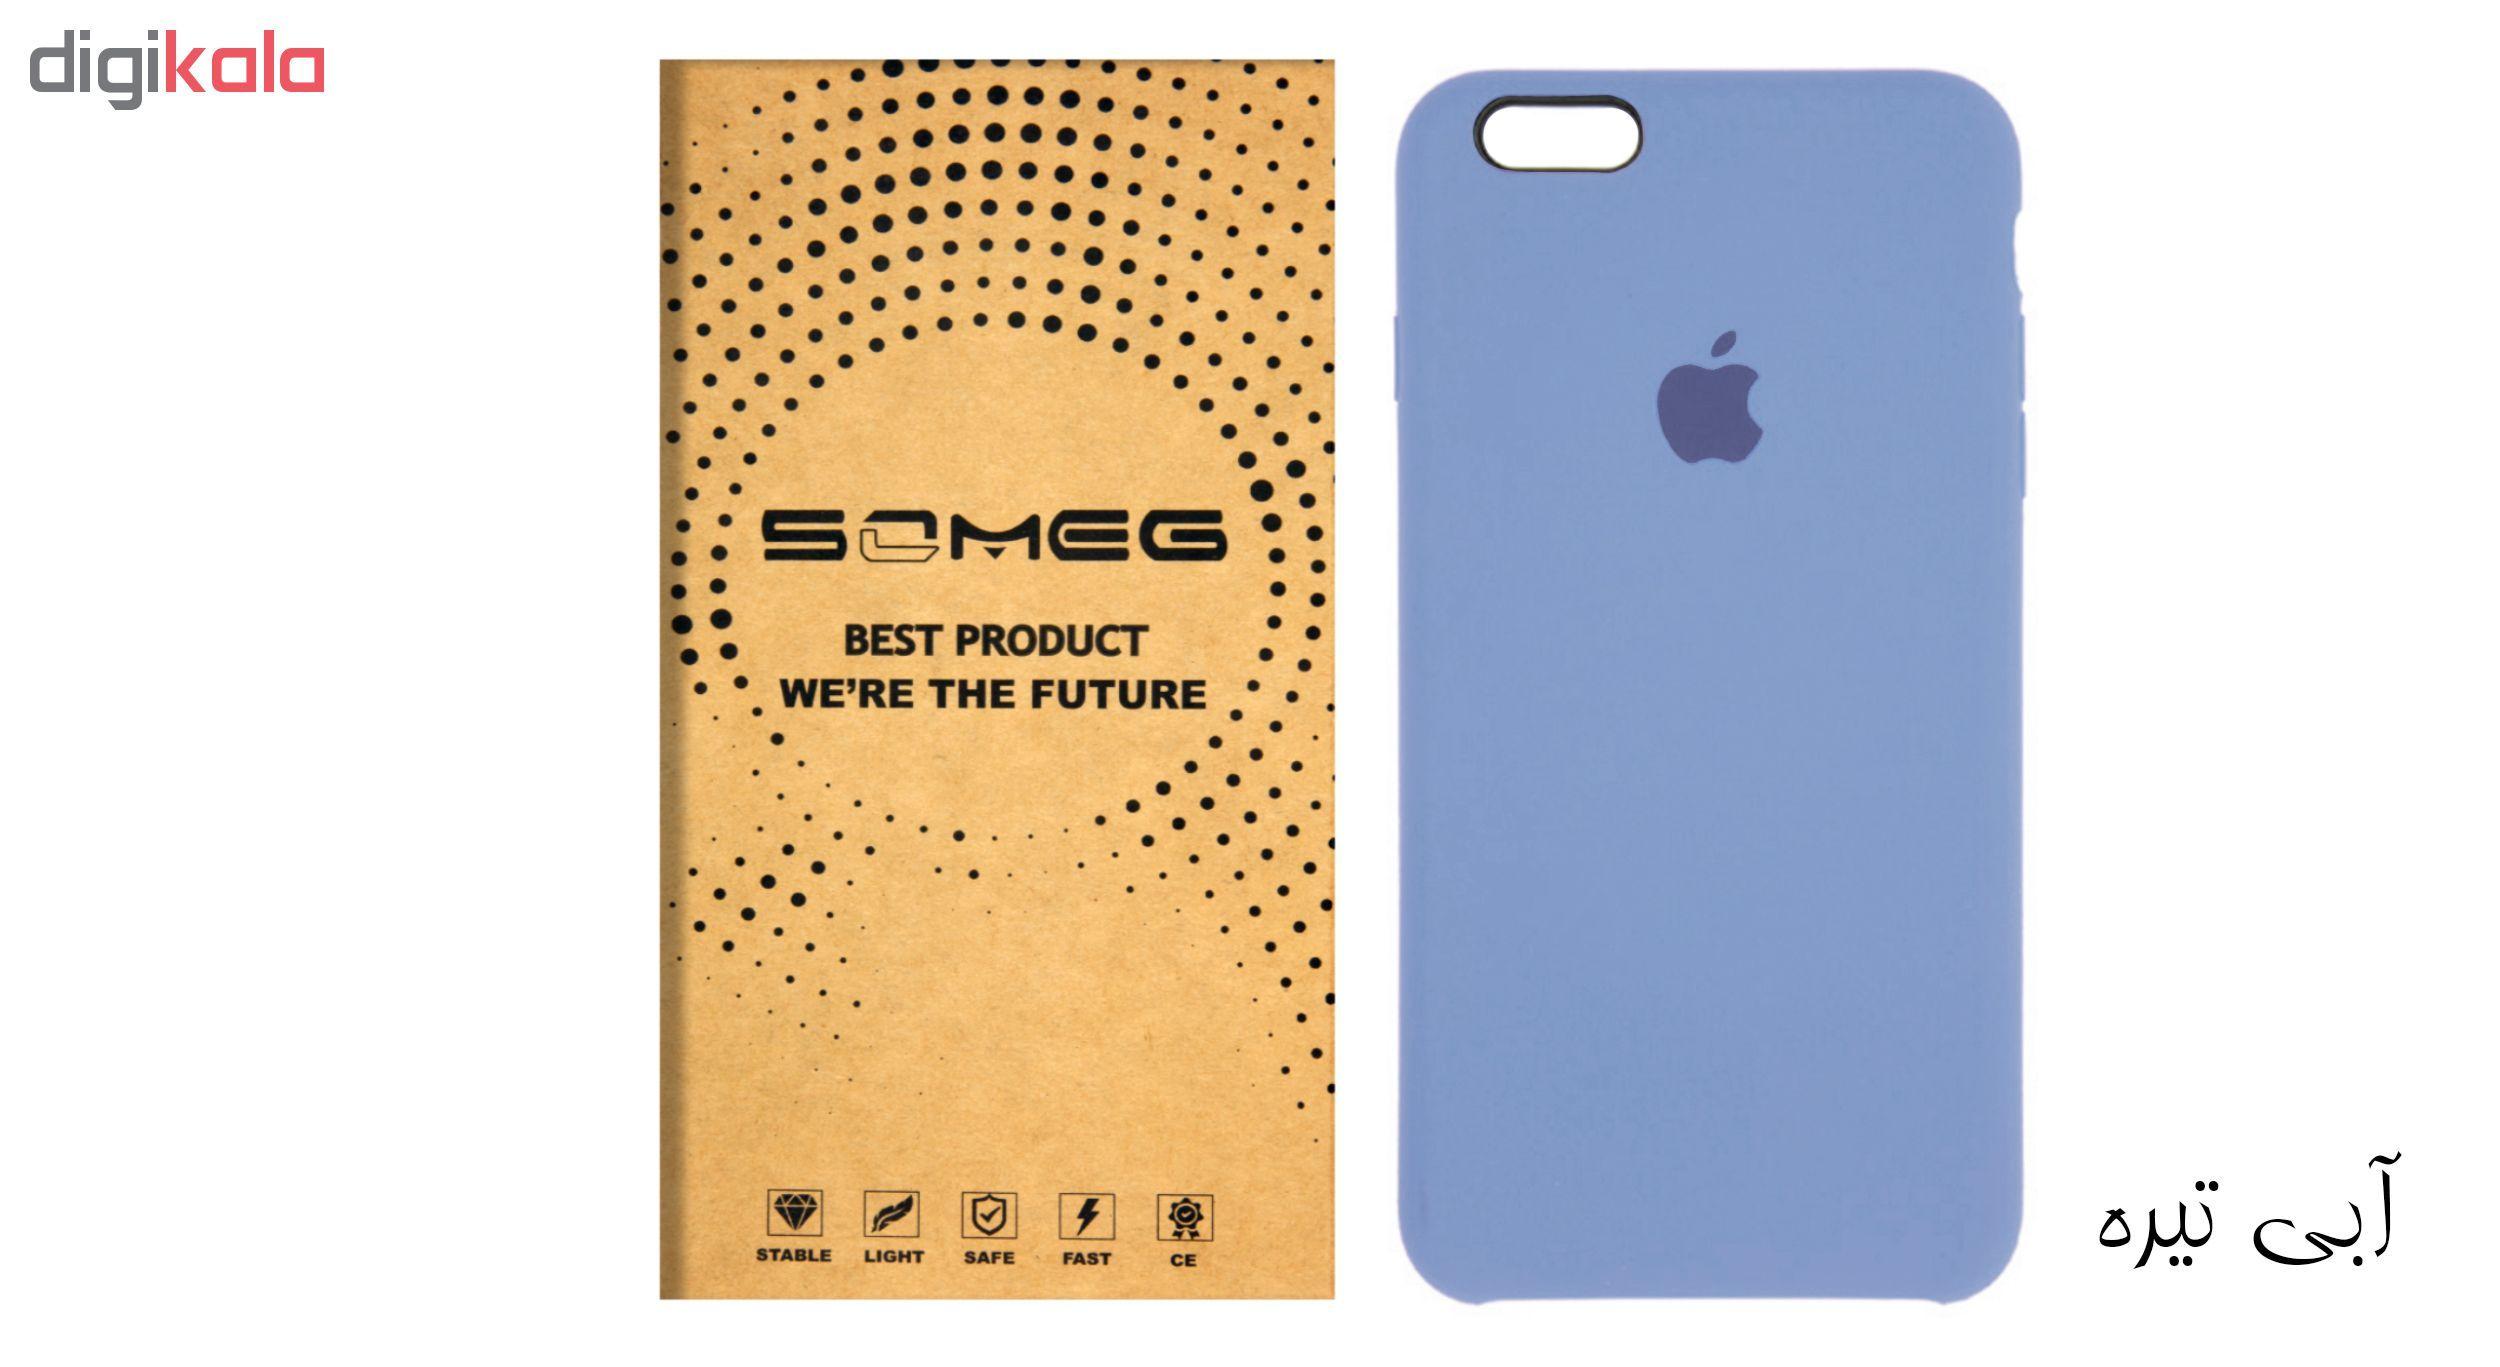 کاور سومگ مدل SIC مناسب برای گوشی موبایل اپل iPhone 6/6s main 1 13